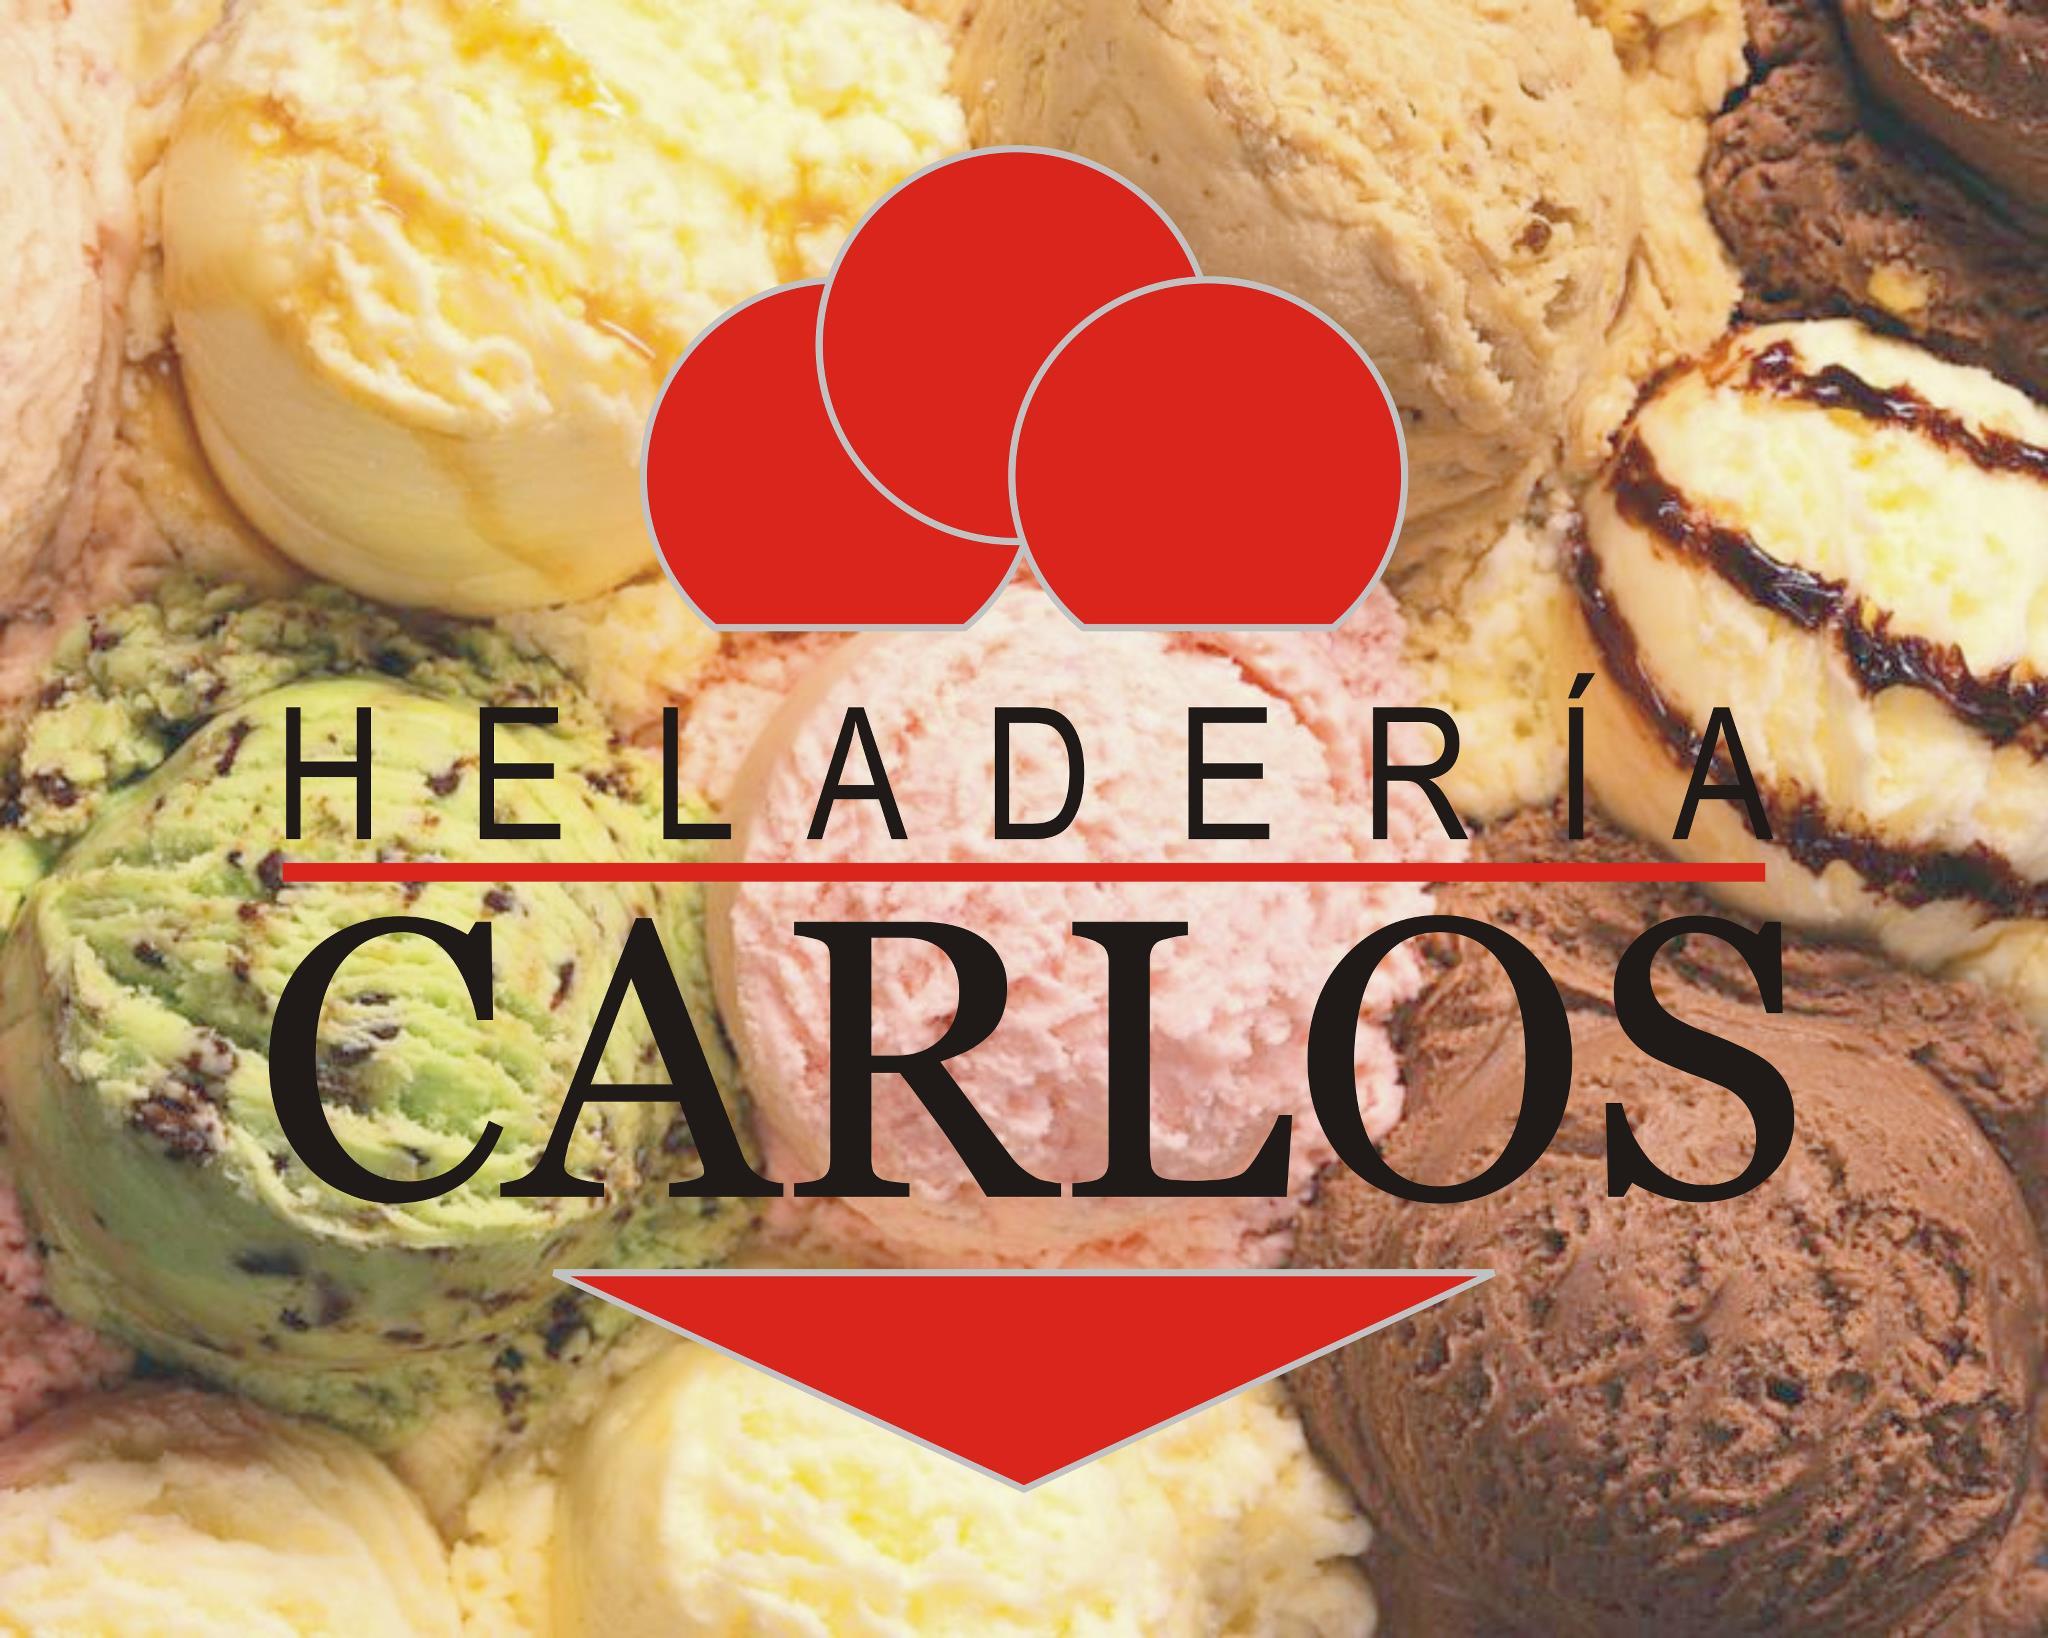 Ice Cream Parlour Carlos in Pinoso Logo